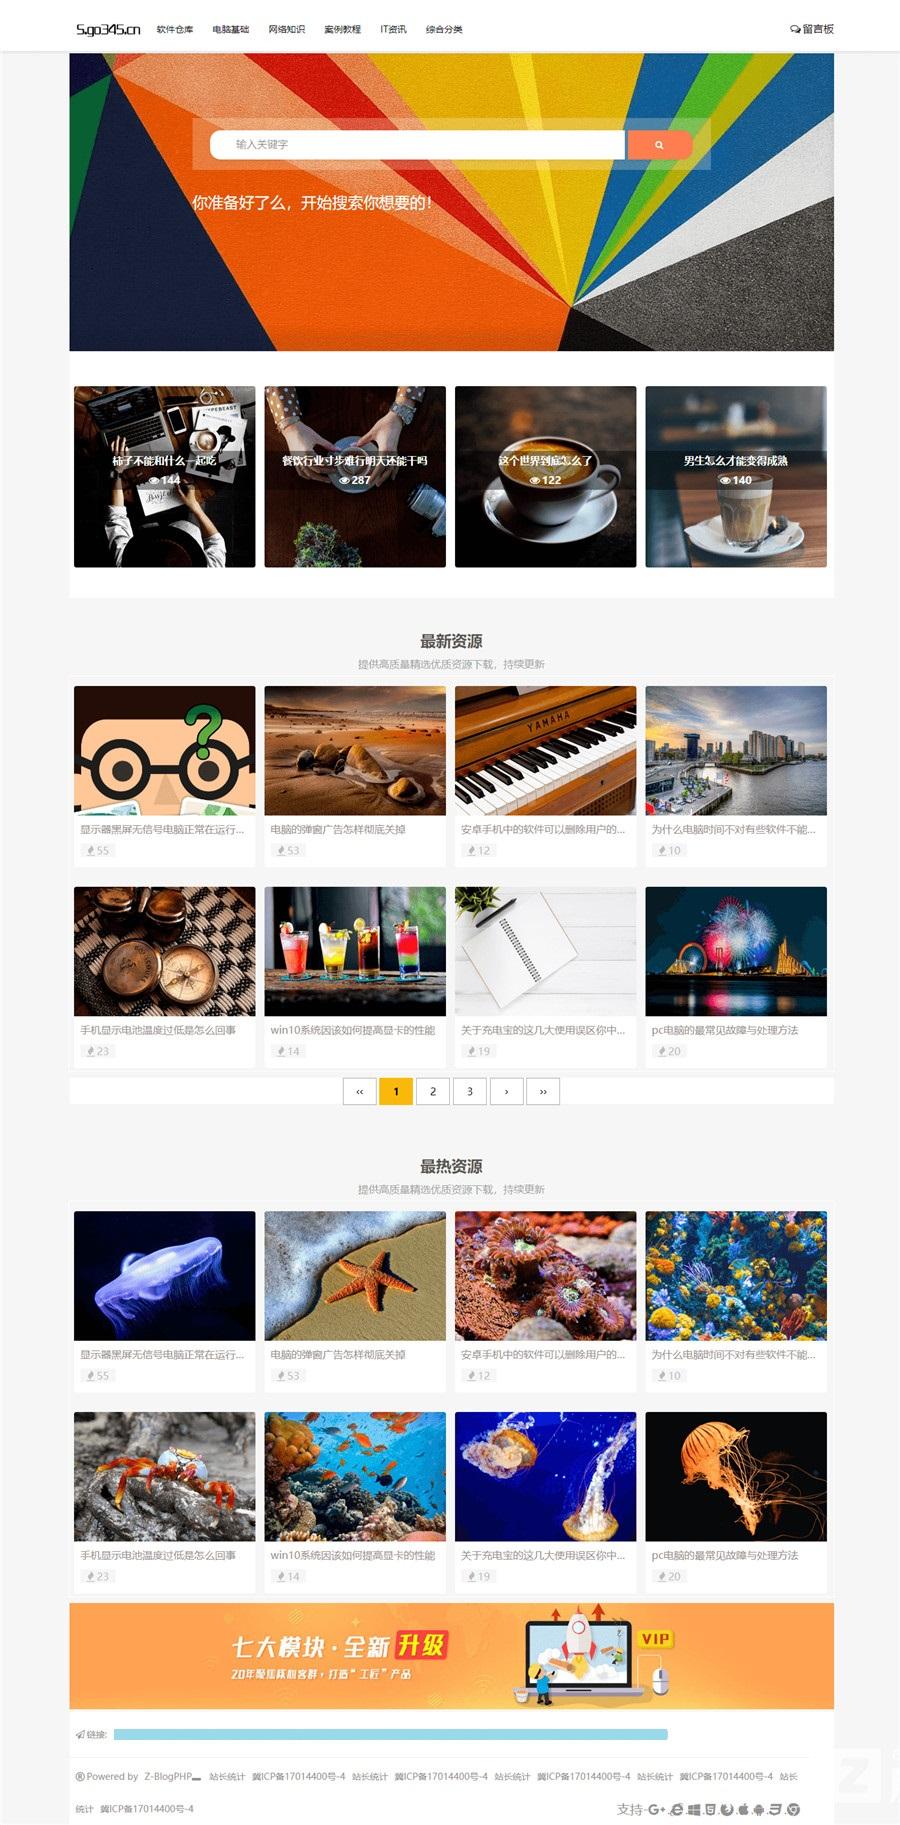 Z-BlogPHP扬名文图blog主题风格模版